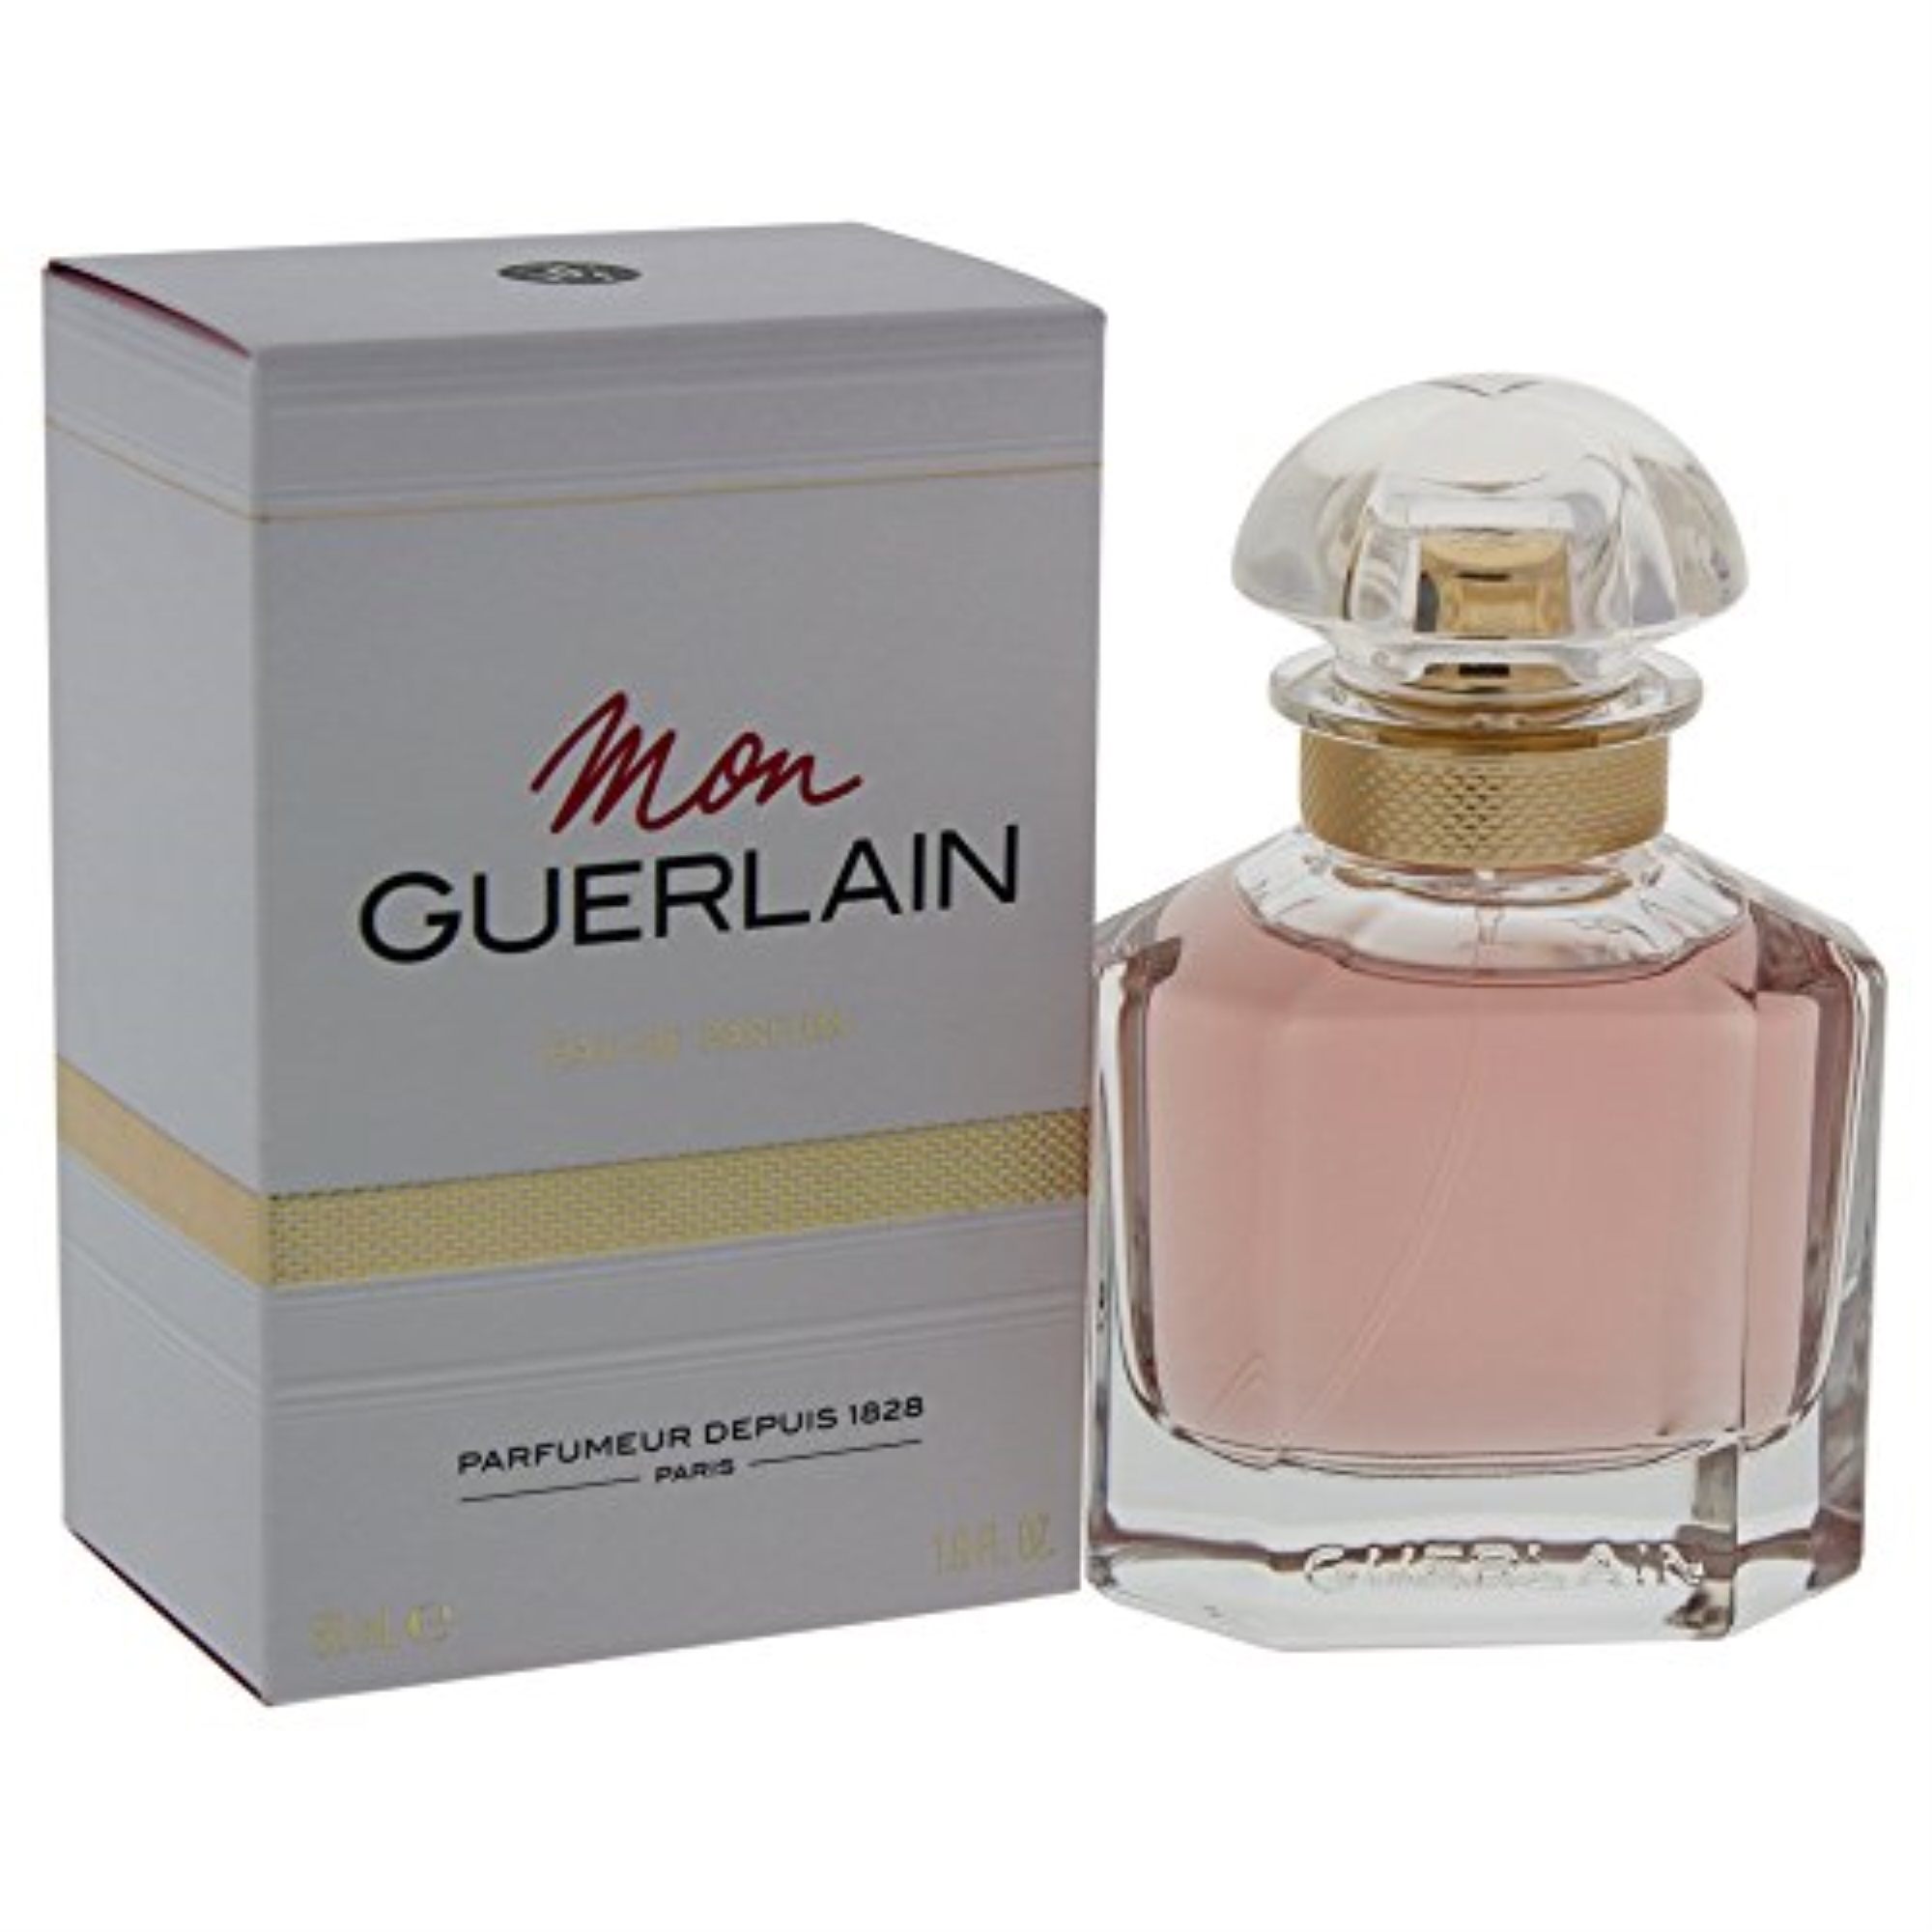 6oz Spray Mon Guerlain Parfum Eau De 50ml1 jLcAq4S35R